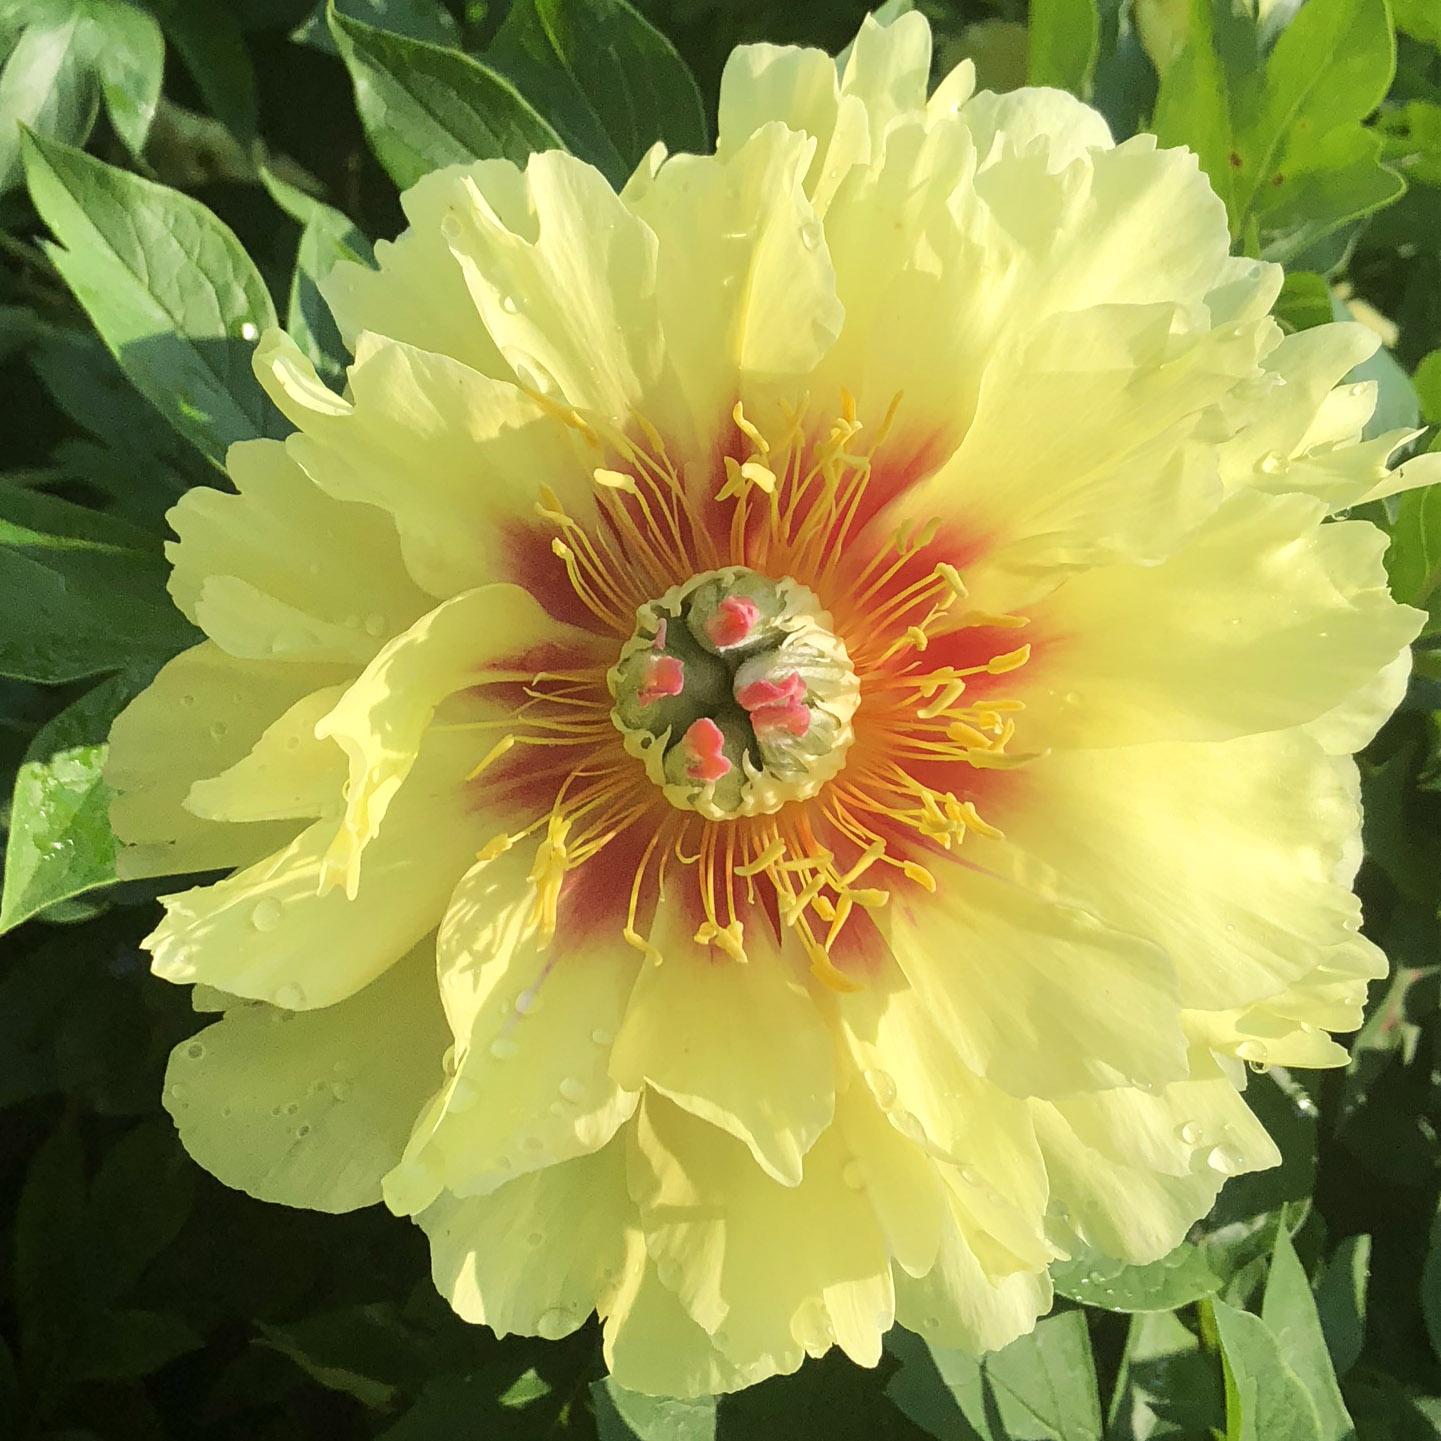 <em>Paeonia</em> 'Garden Treasure' (Intersectional/Itoh)